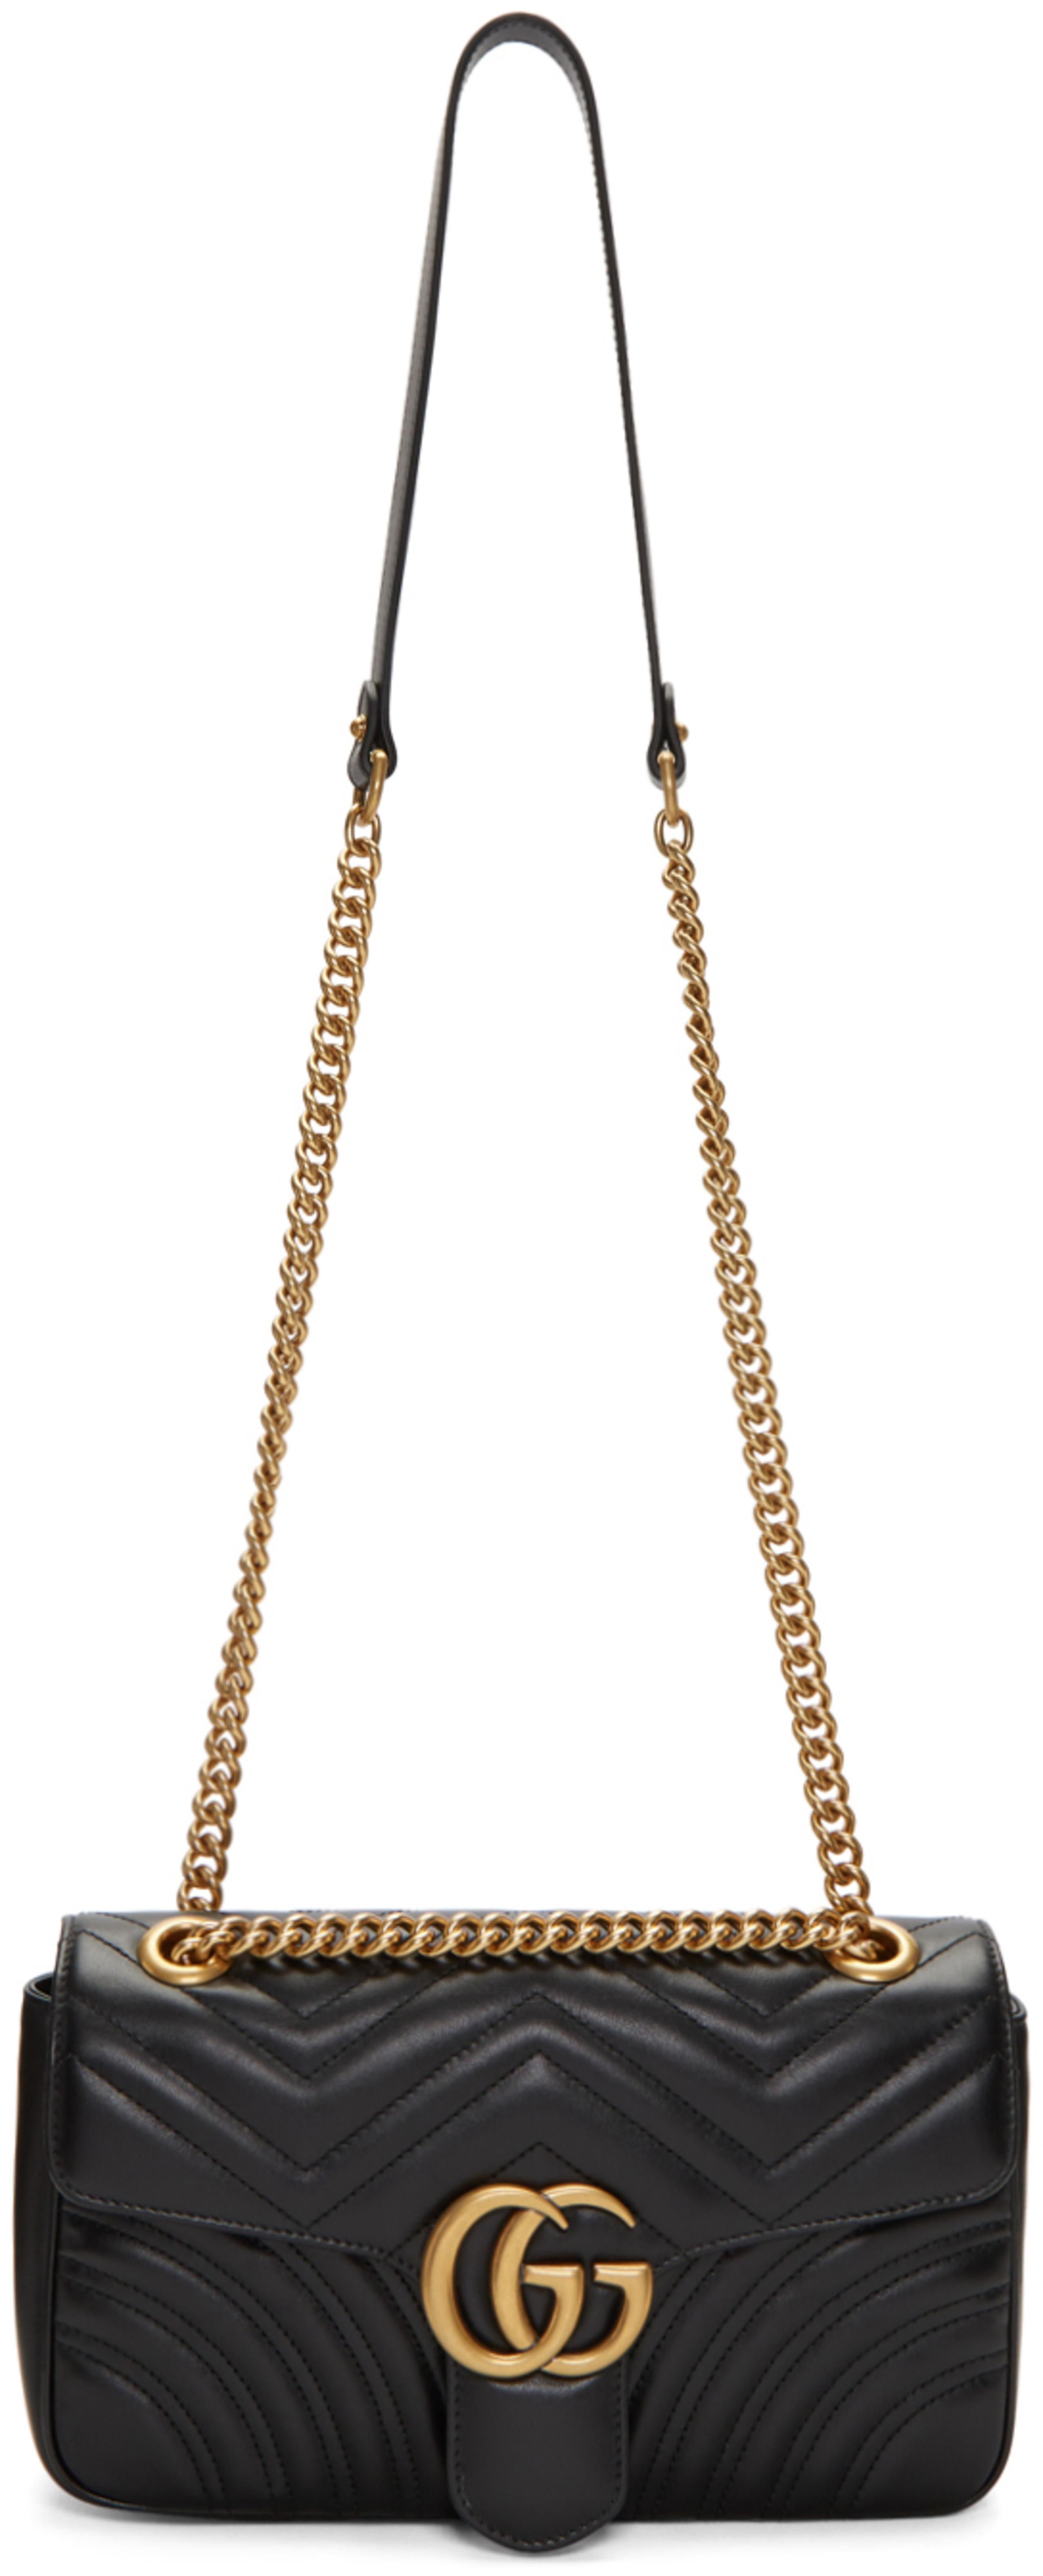 3d33105adae6 Gucci bags for Women | SSENSE